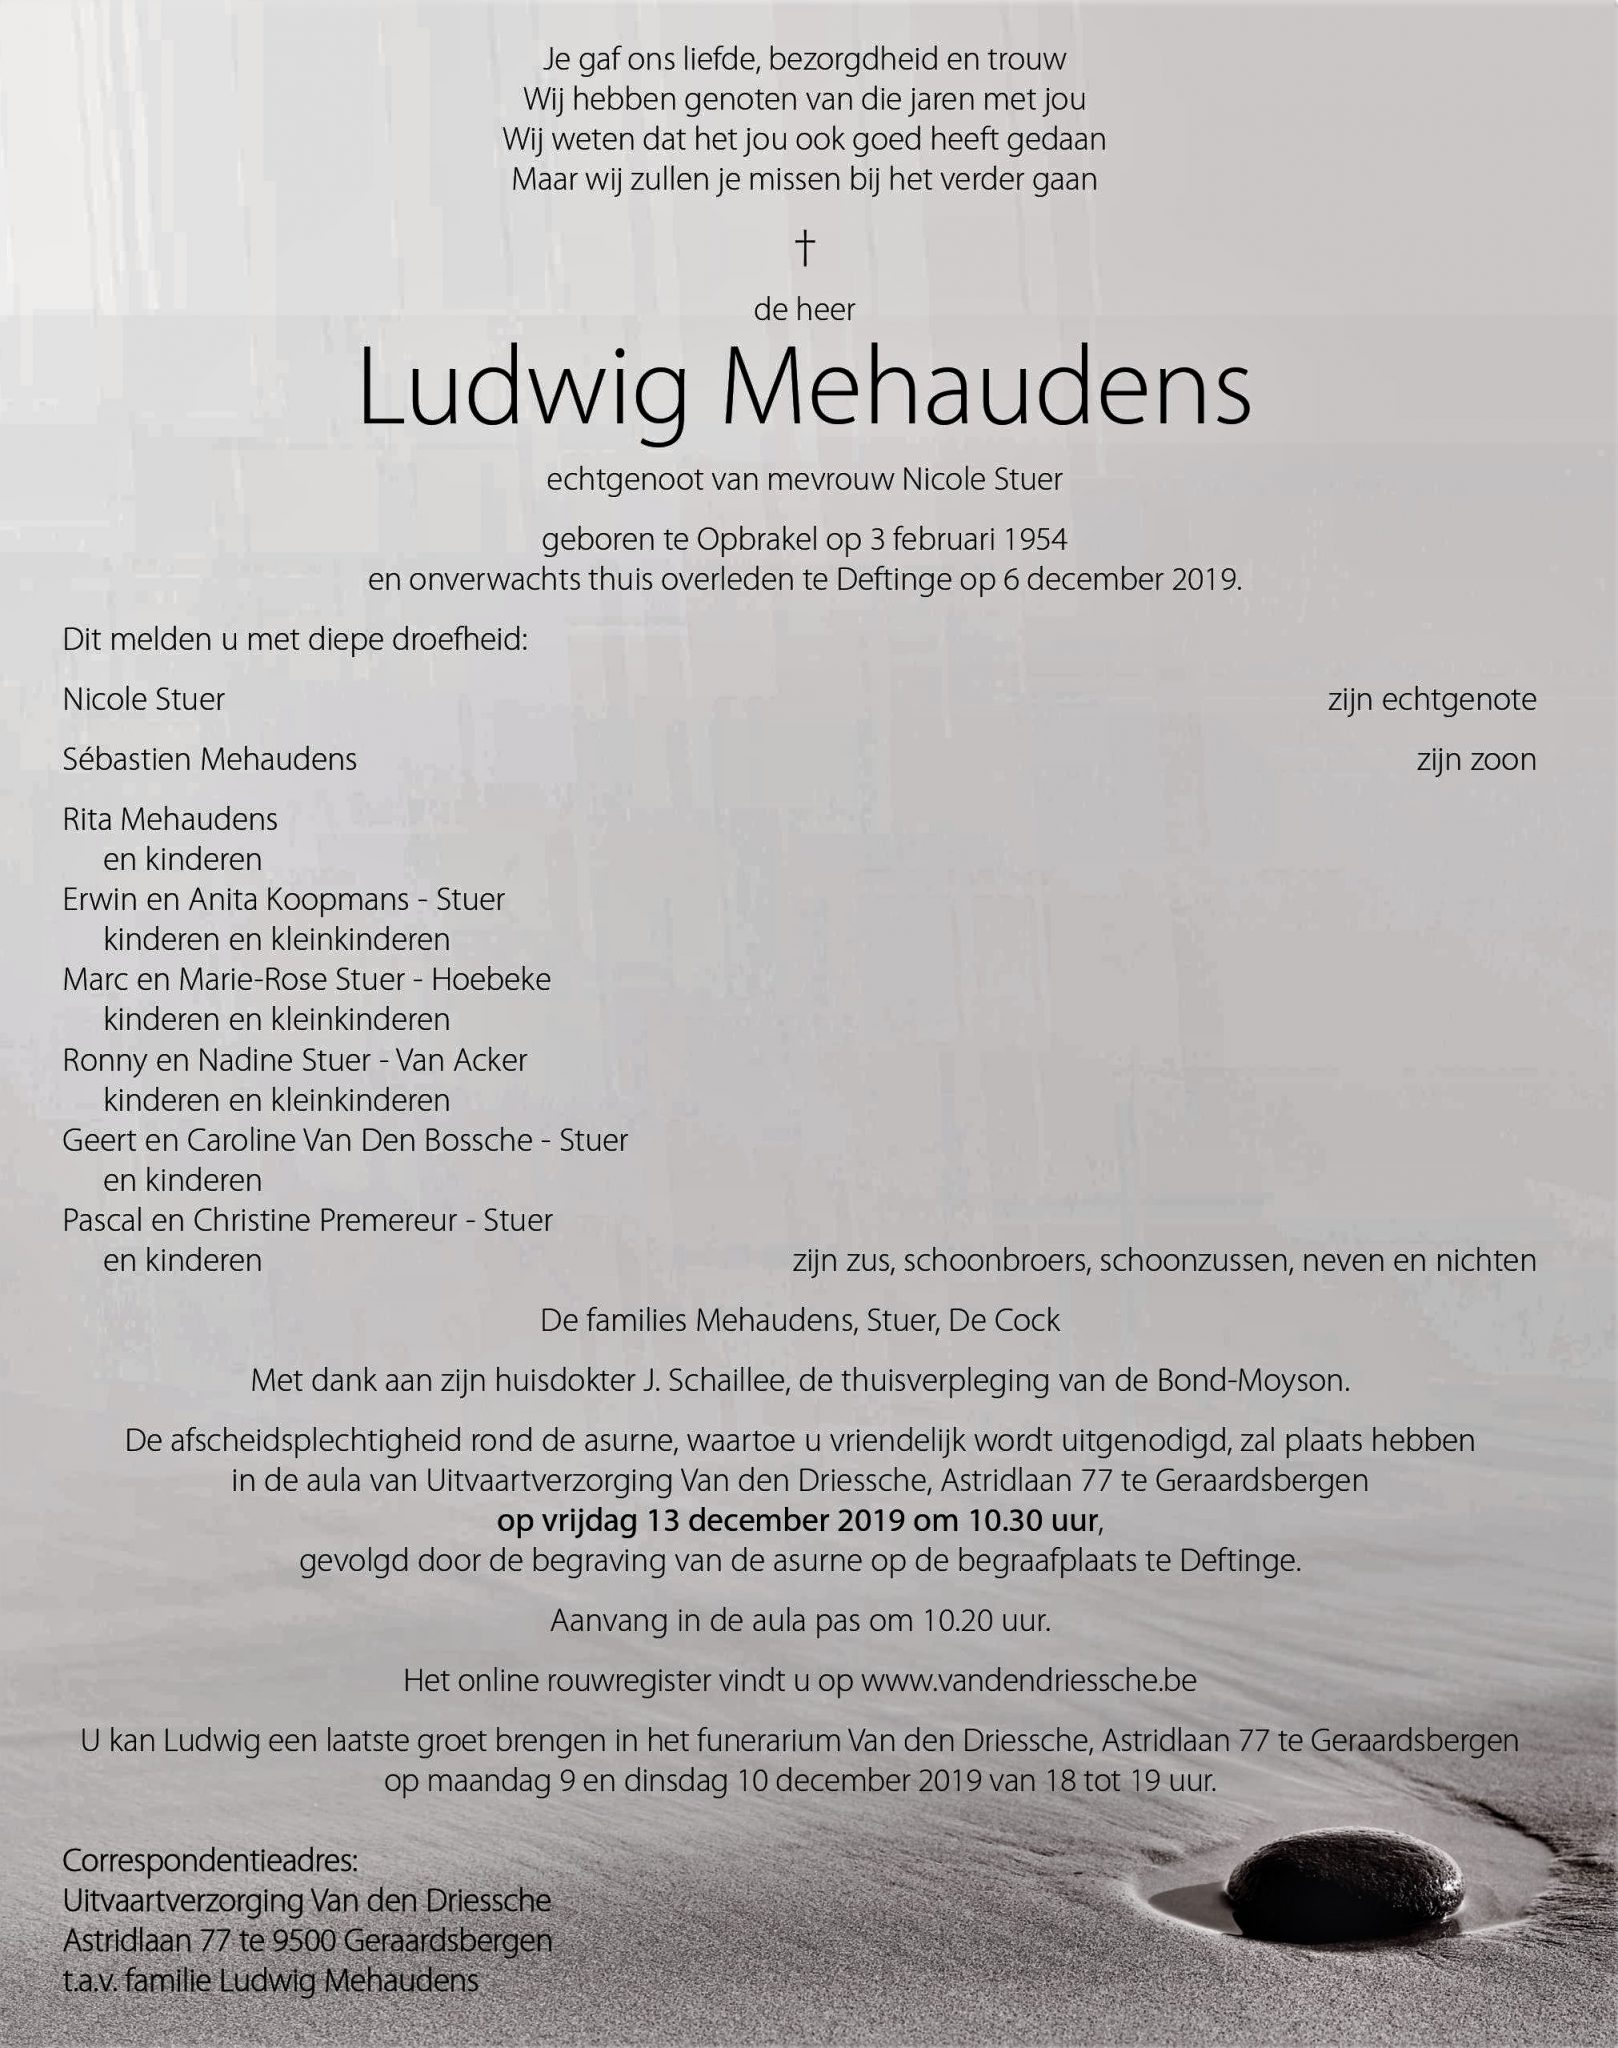 rouwbrief Mehaudens Ludwig